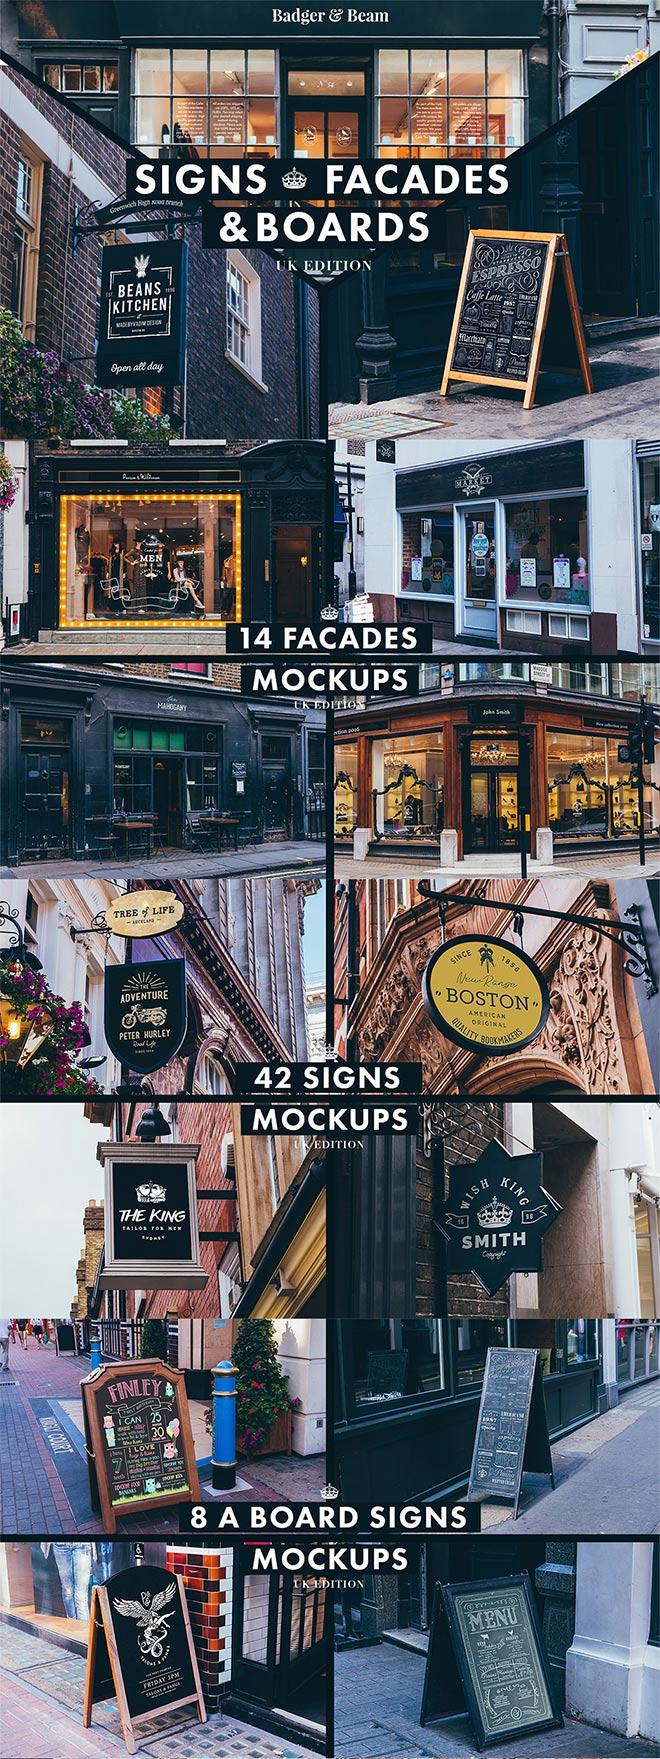 Signs and Facades Mockups